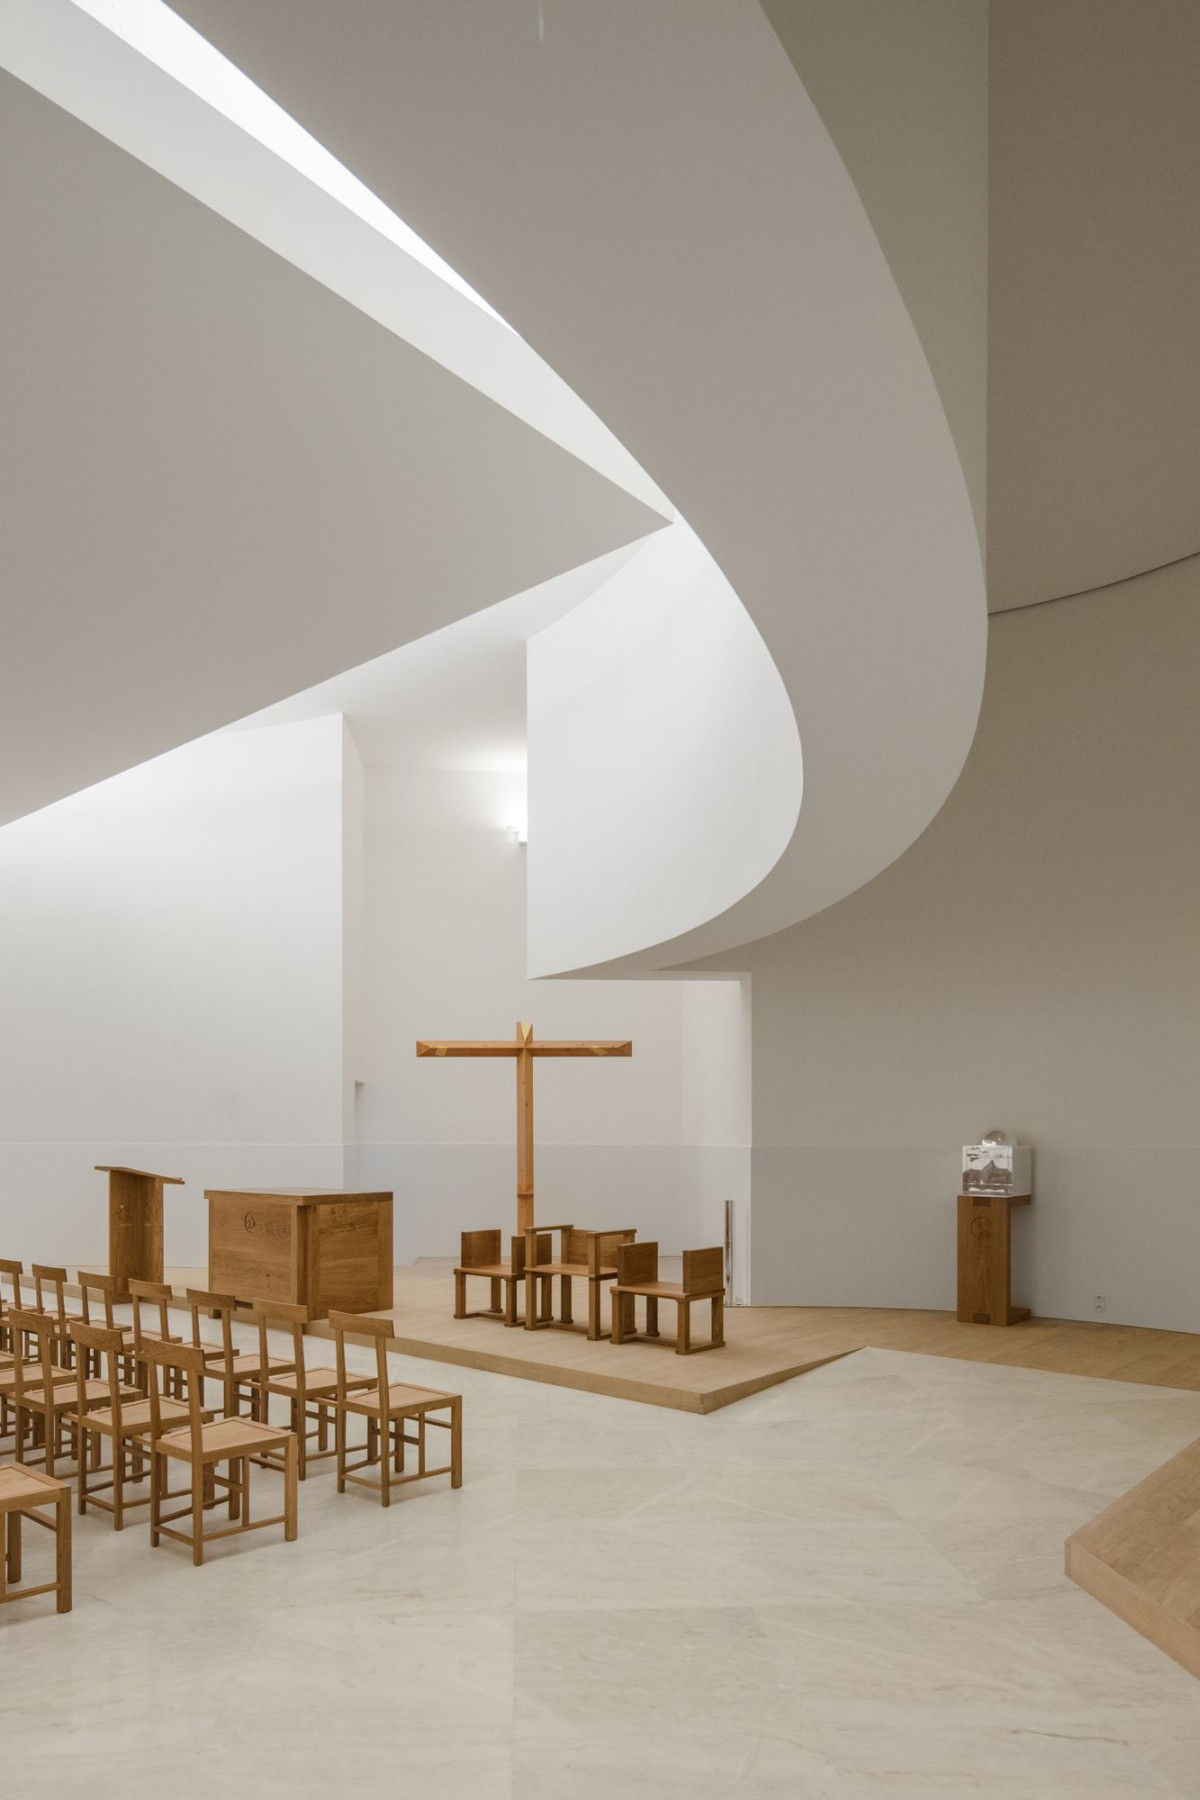 Alvaro Siza . Church of Saint-Jacques de la Lande . Rennes (40)